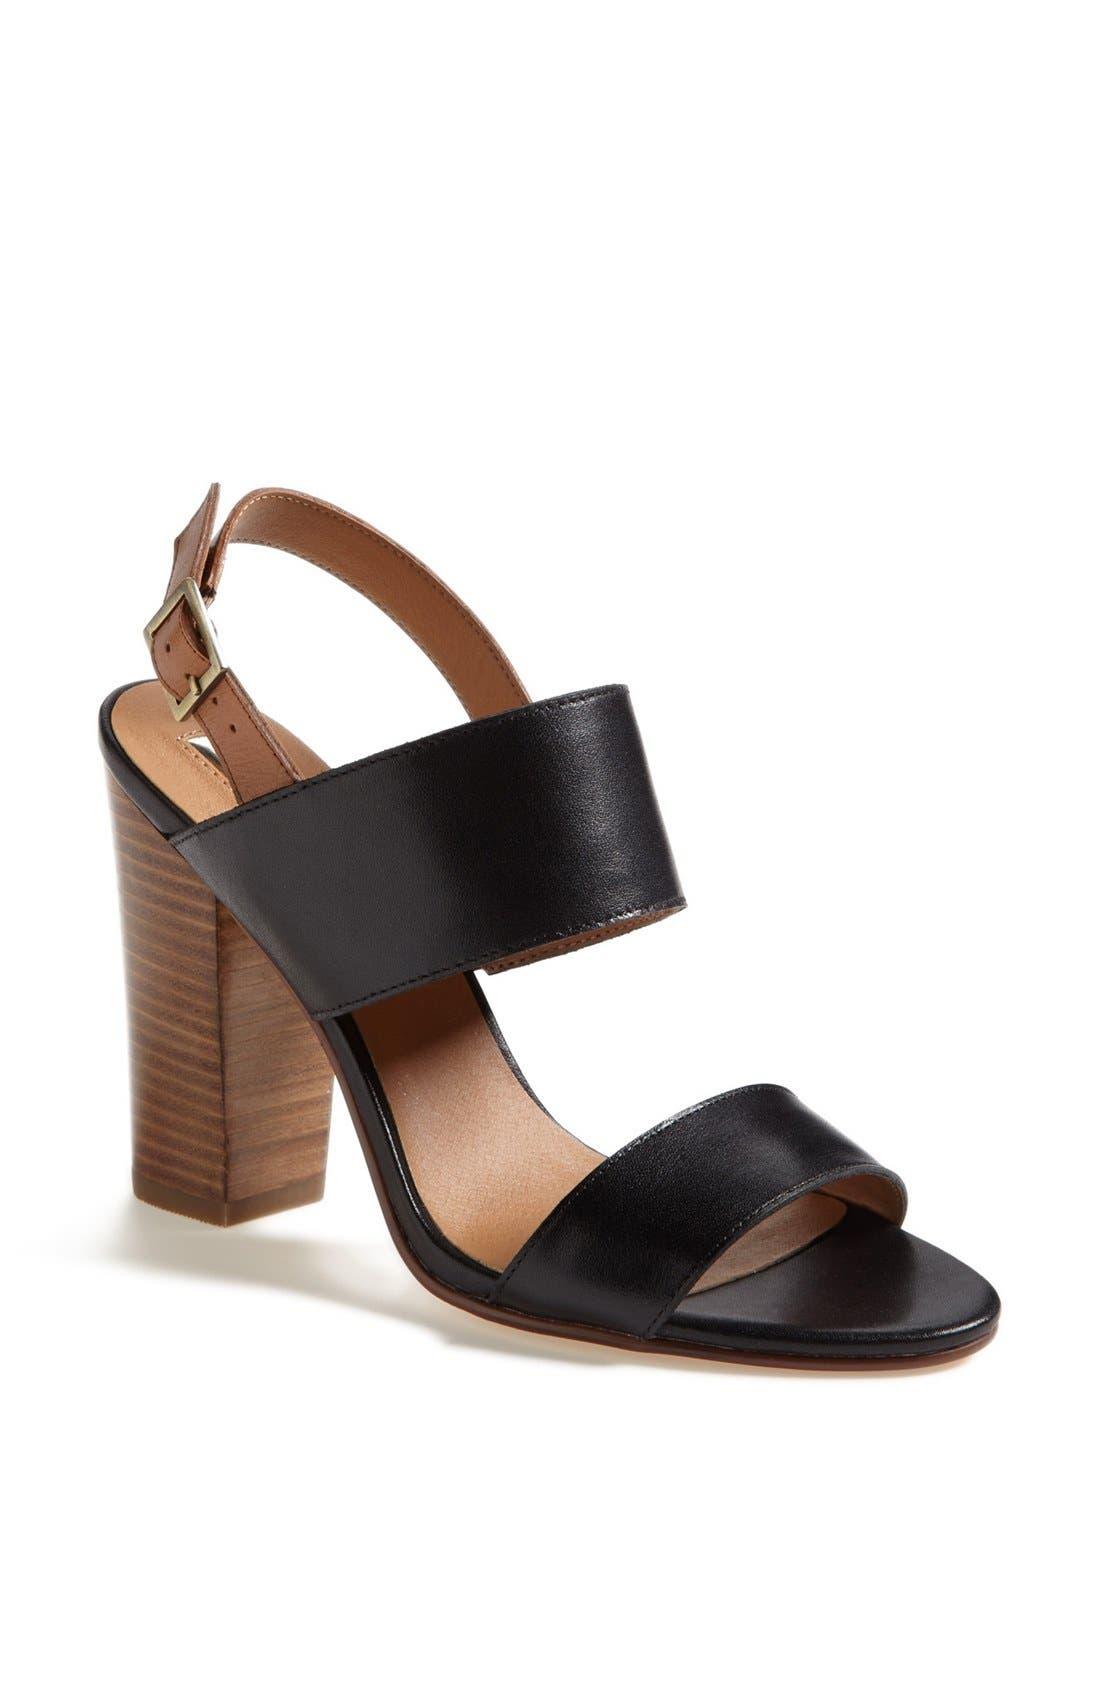 Alternate Image 1 Selected - Halogen® 'Sonia' Sandal